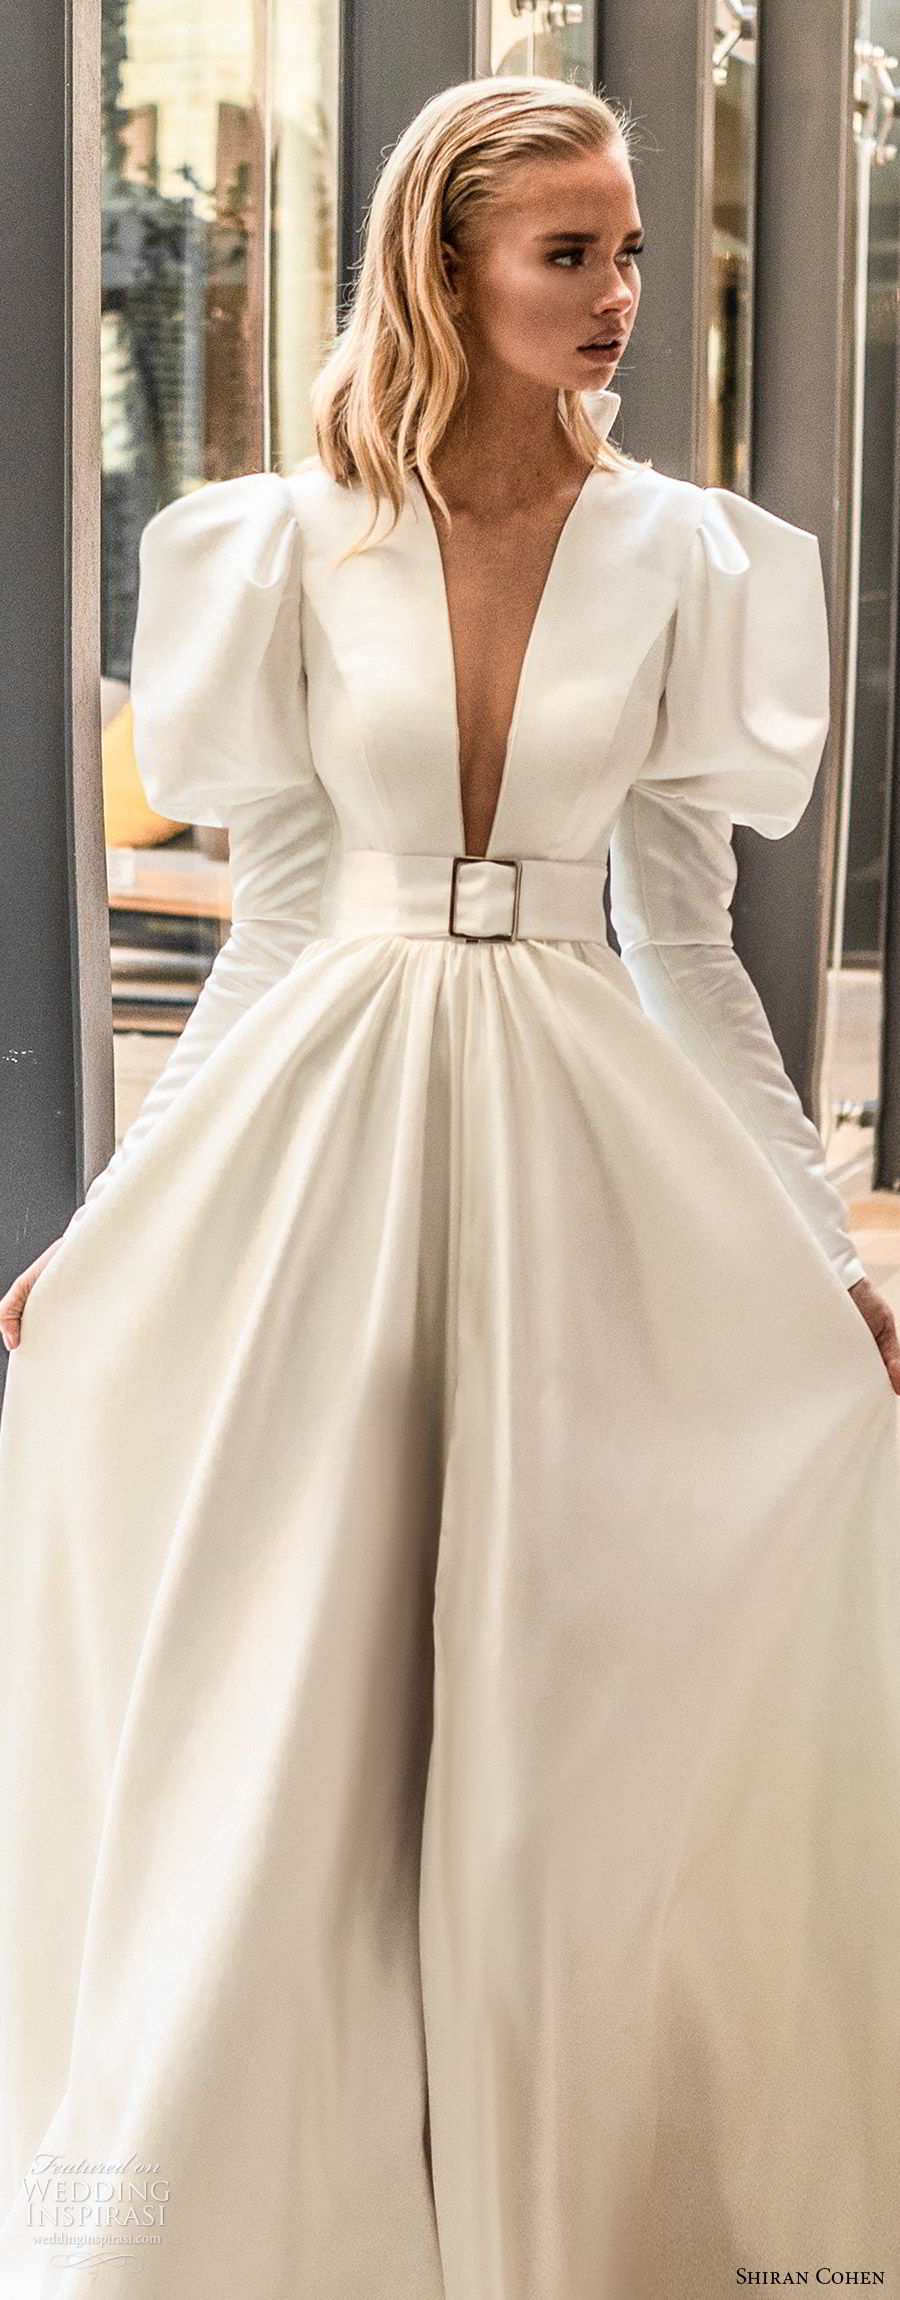 shiran cohen 2019 bridal mutton sleeves plunging v neckline collar belt a line ball gown wedding dress chapel train romantic princess clean modern (5) lv